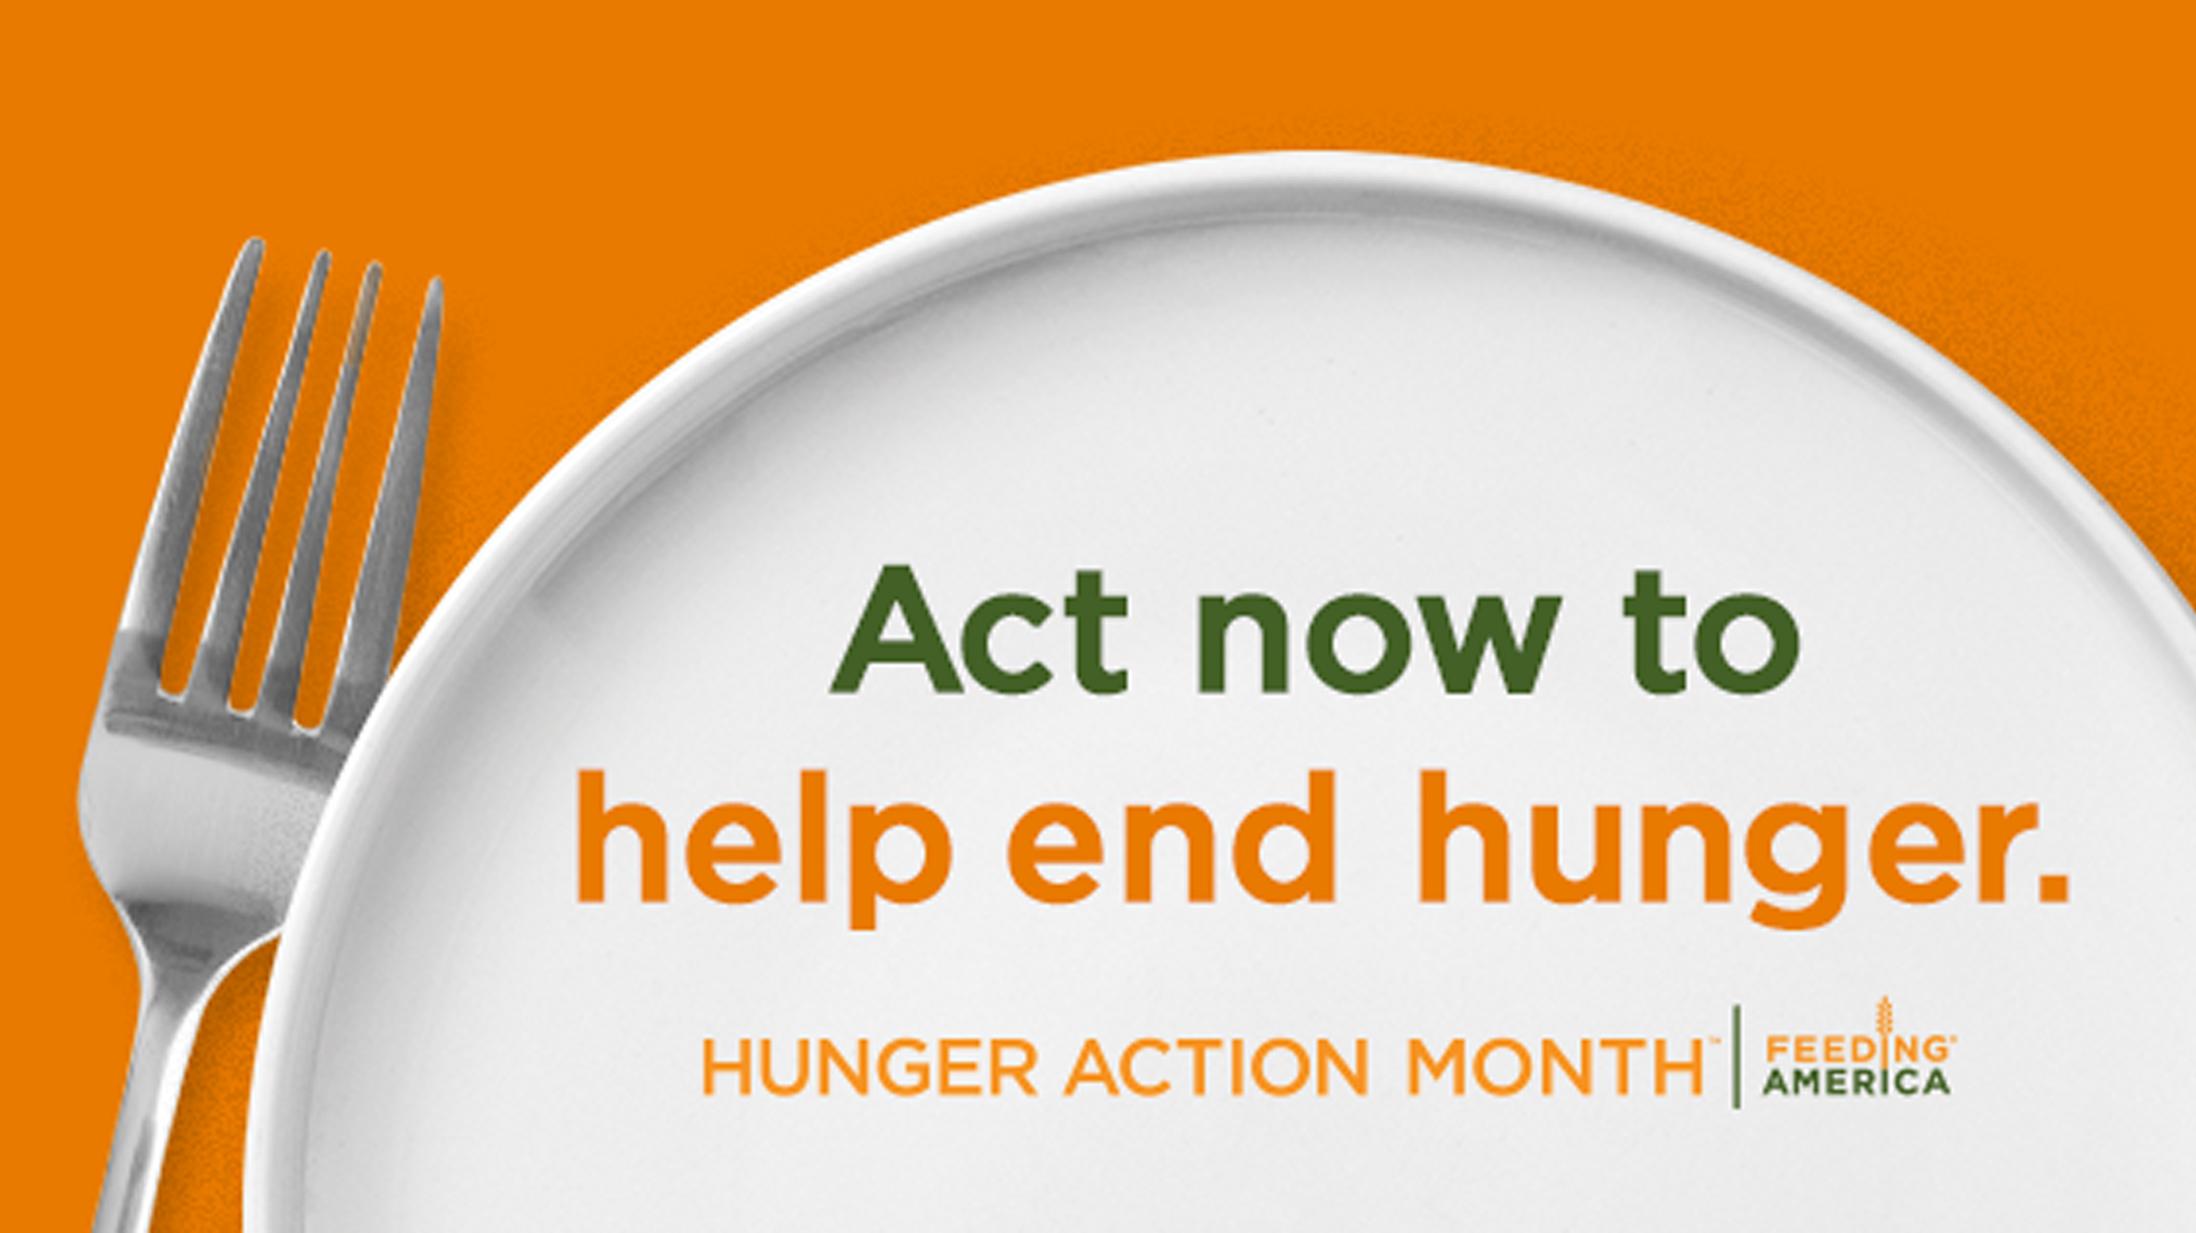 Stop Hunger Food Bank 09 06 2016_1473162588989.jpg